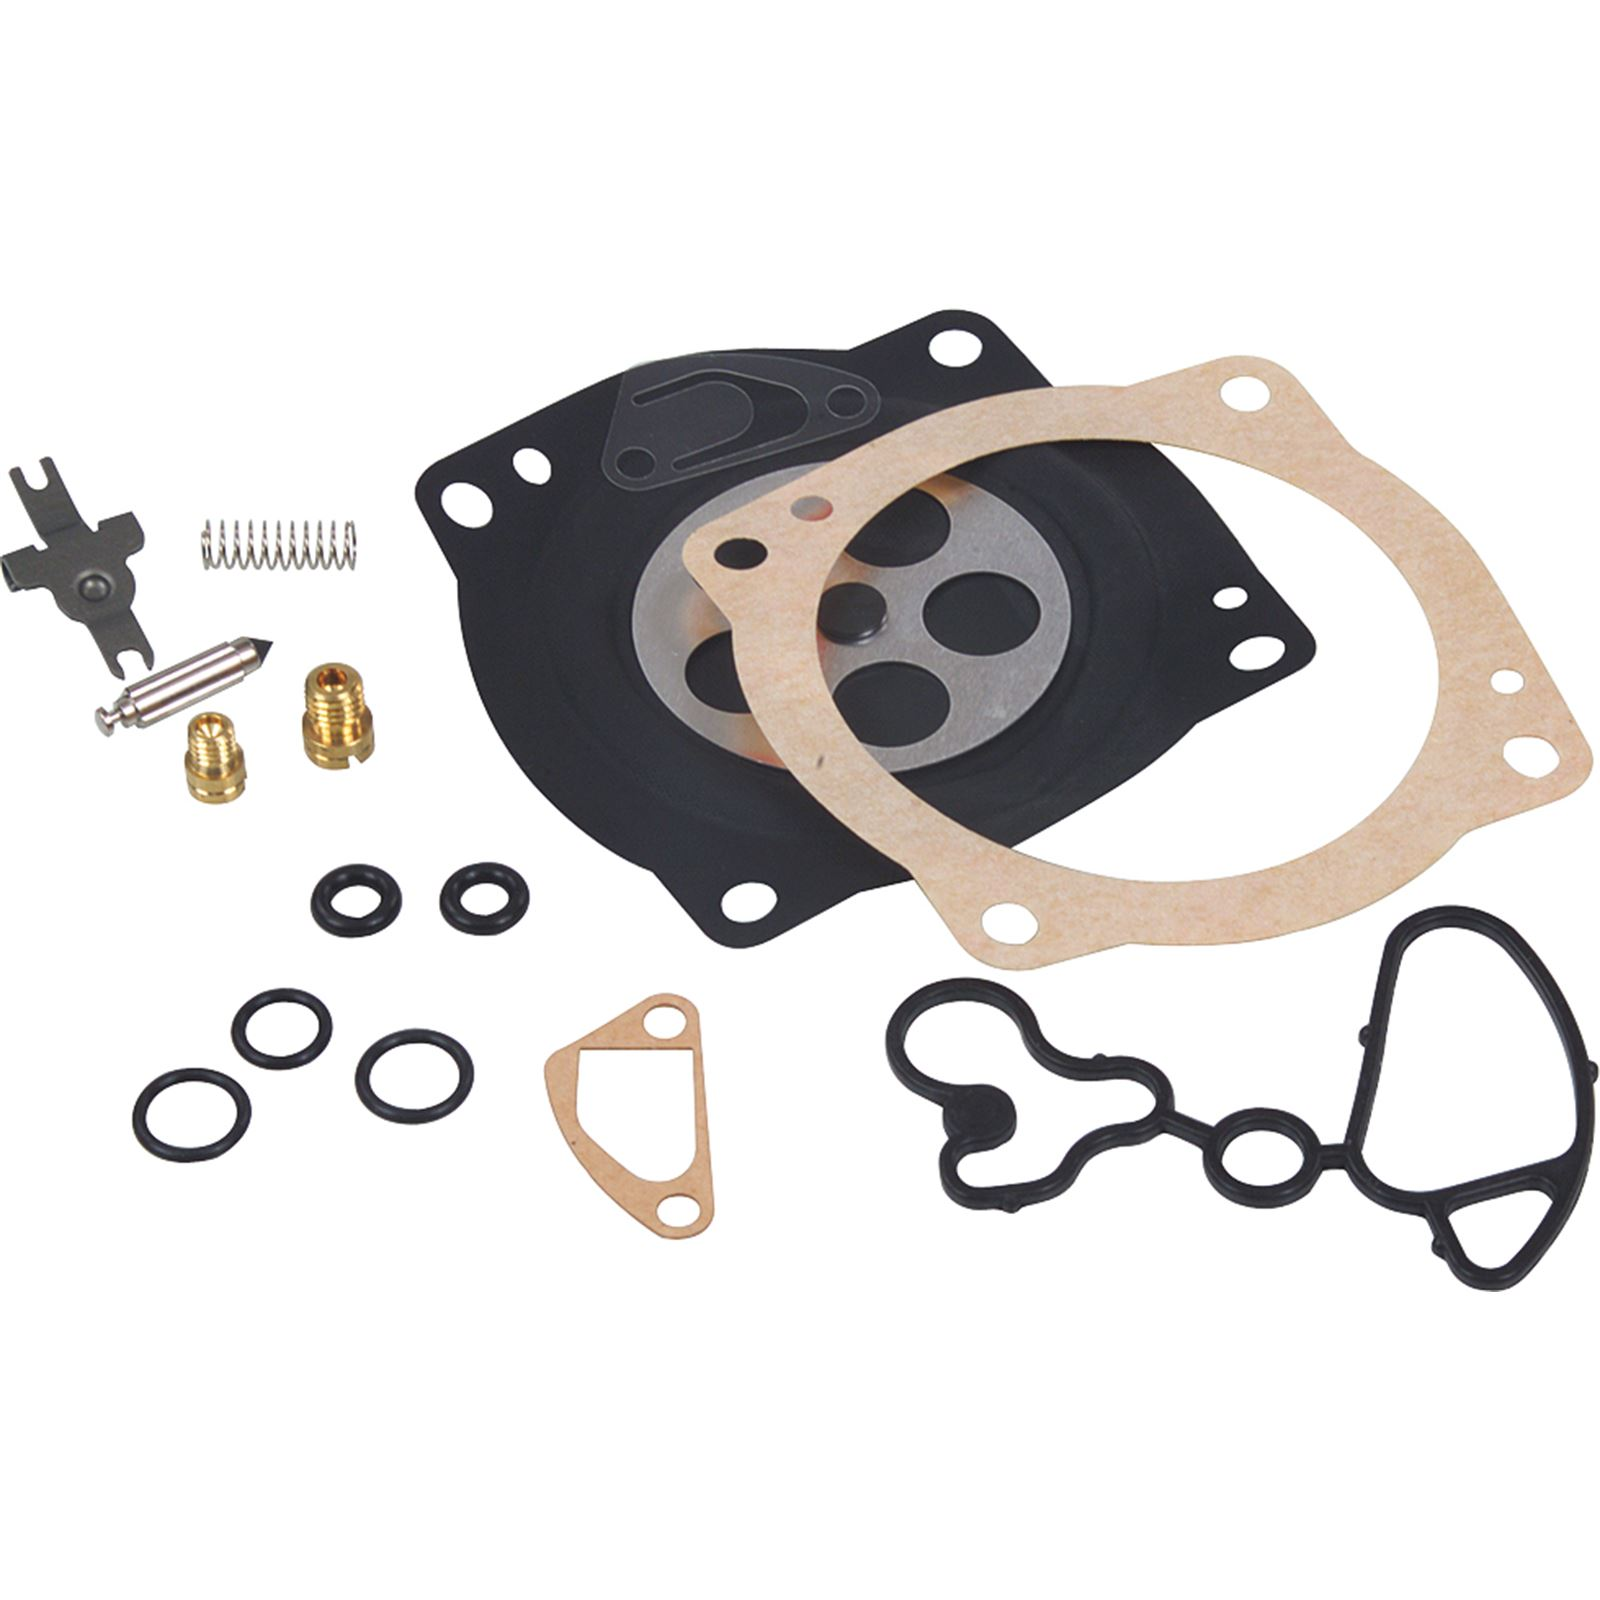 Sudco External Fuel Pump Rebuild Kit